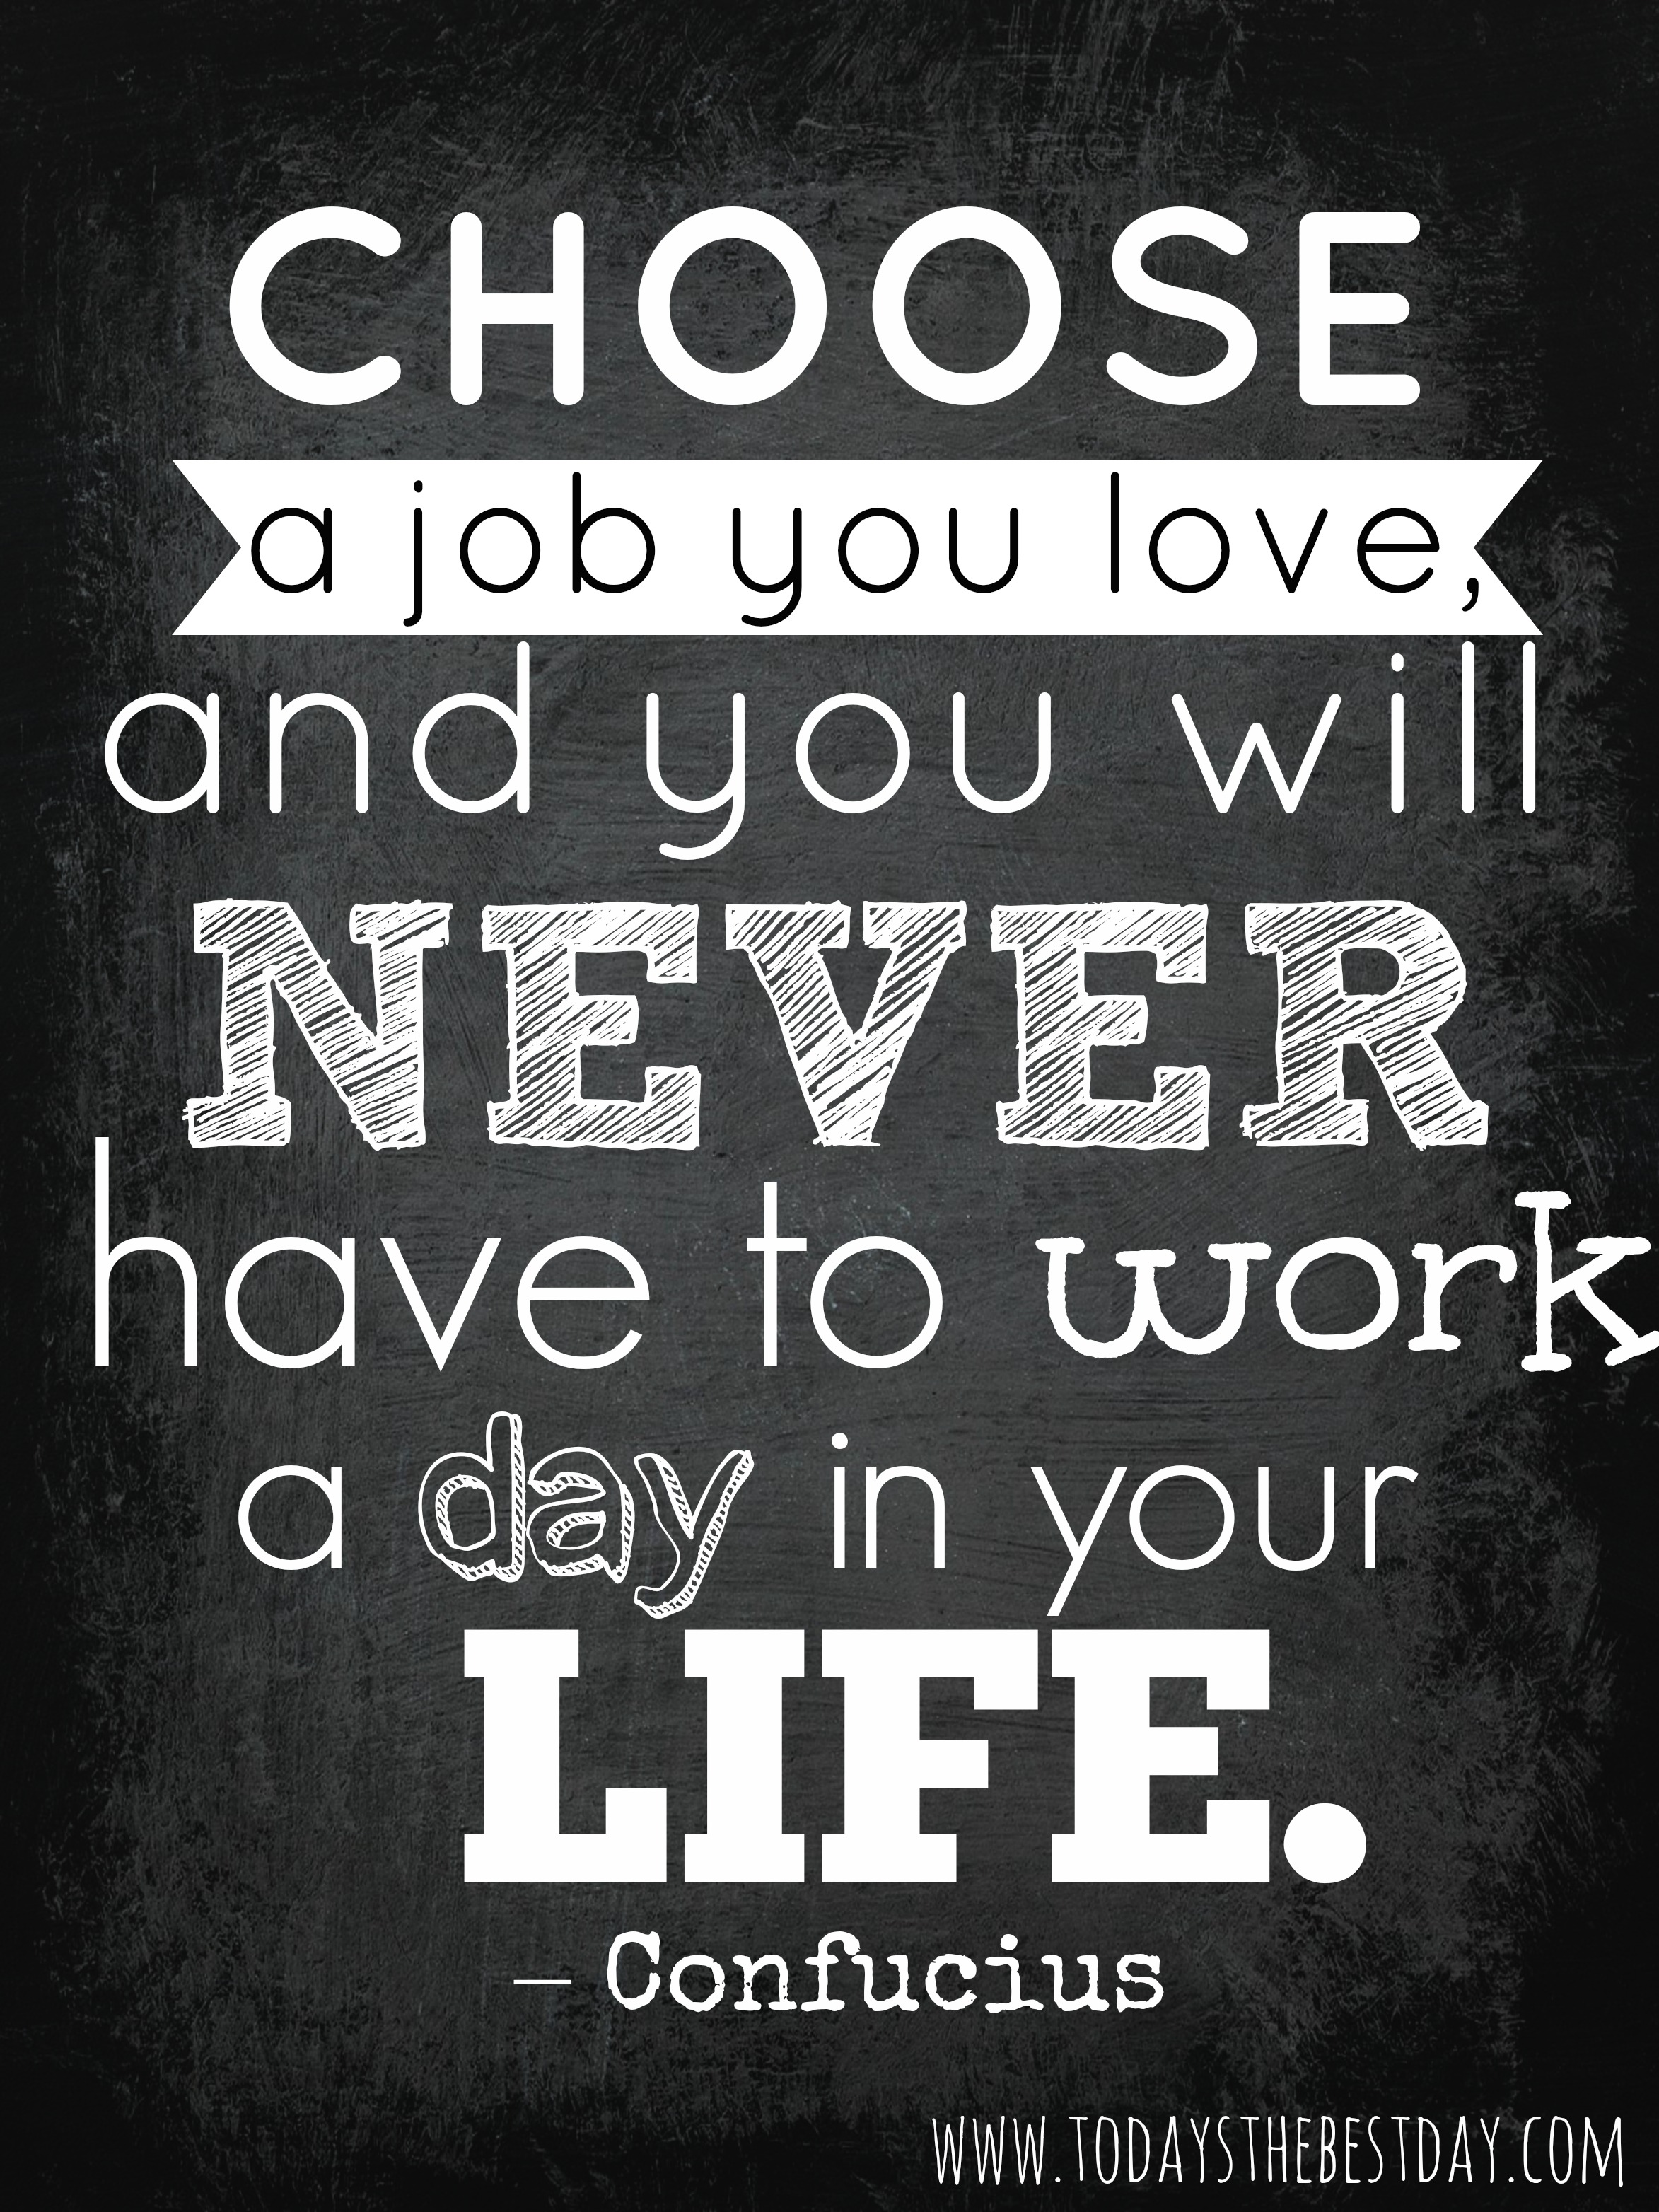 https://i2.wp.com/www.todaysthebestday.com/wp-content/uploads/2014/04/Choose-a-job-you-love.jpg